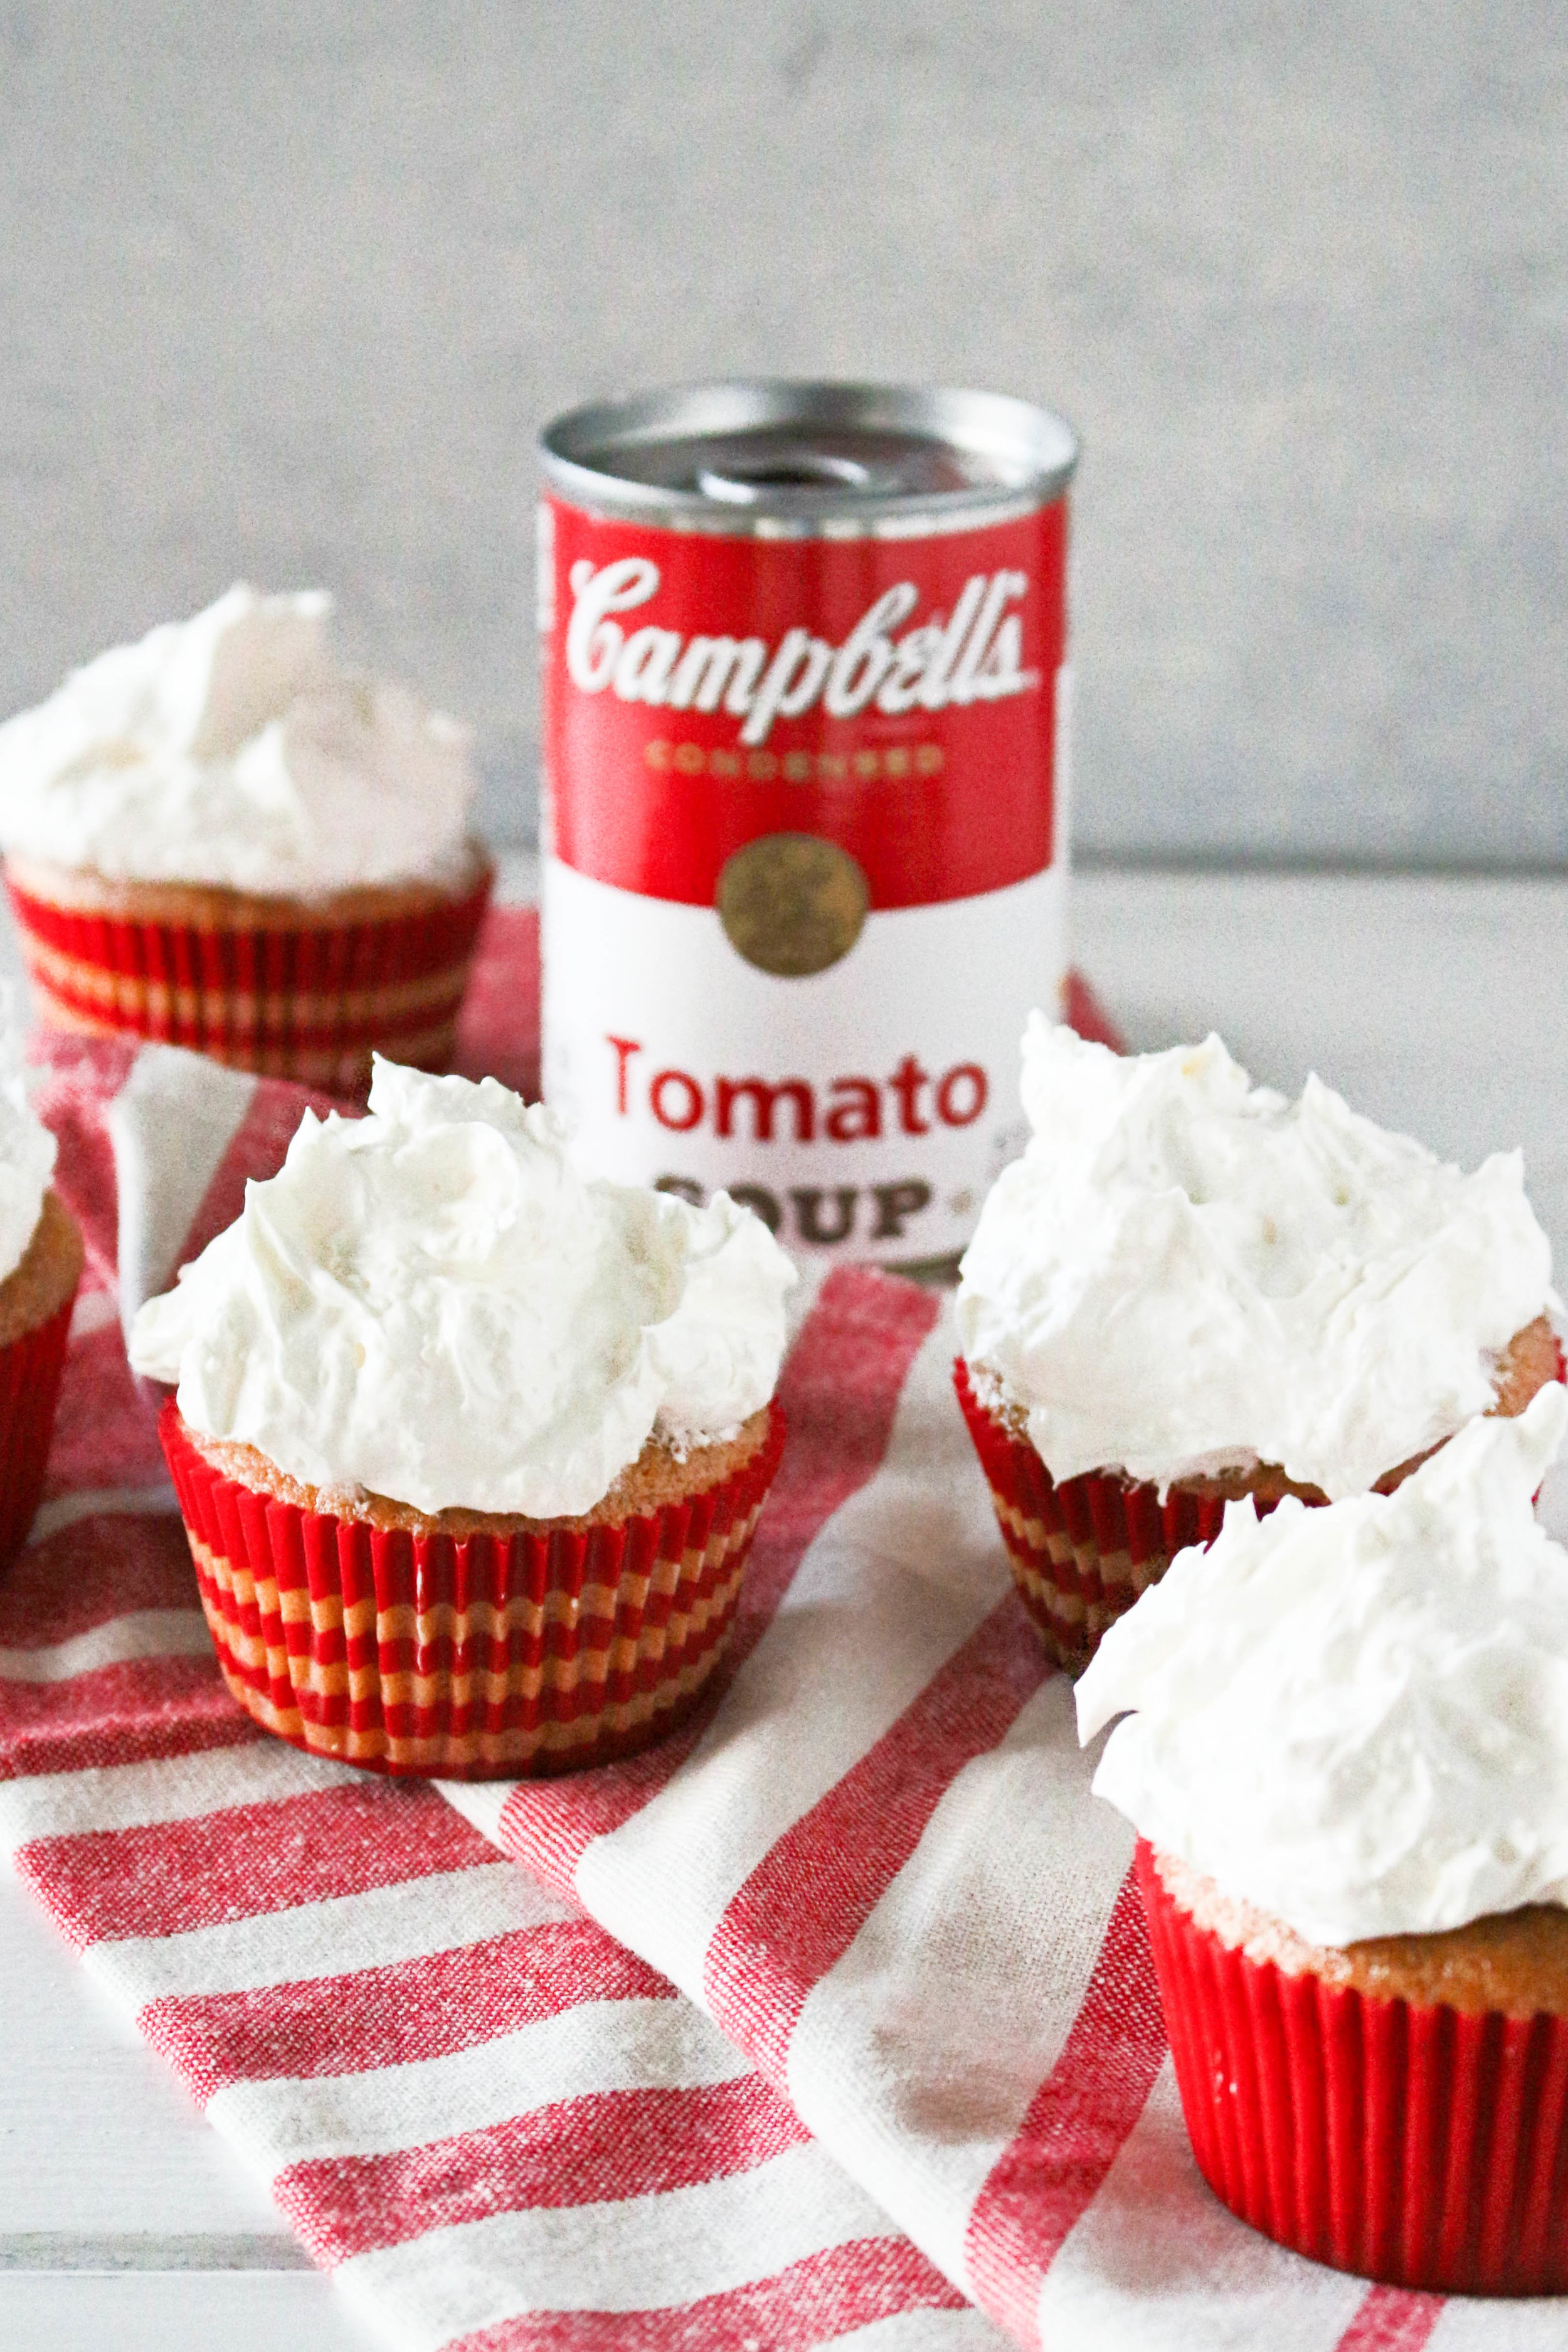 Tomato Soup Cupcakes